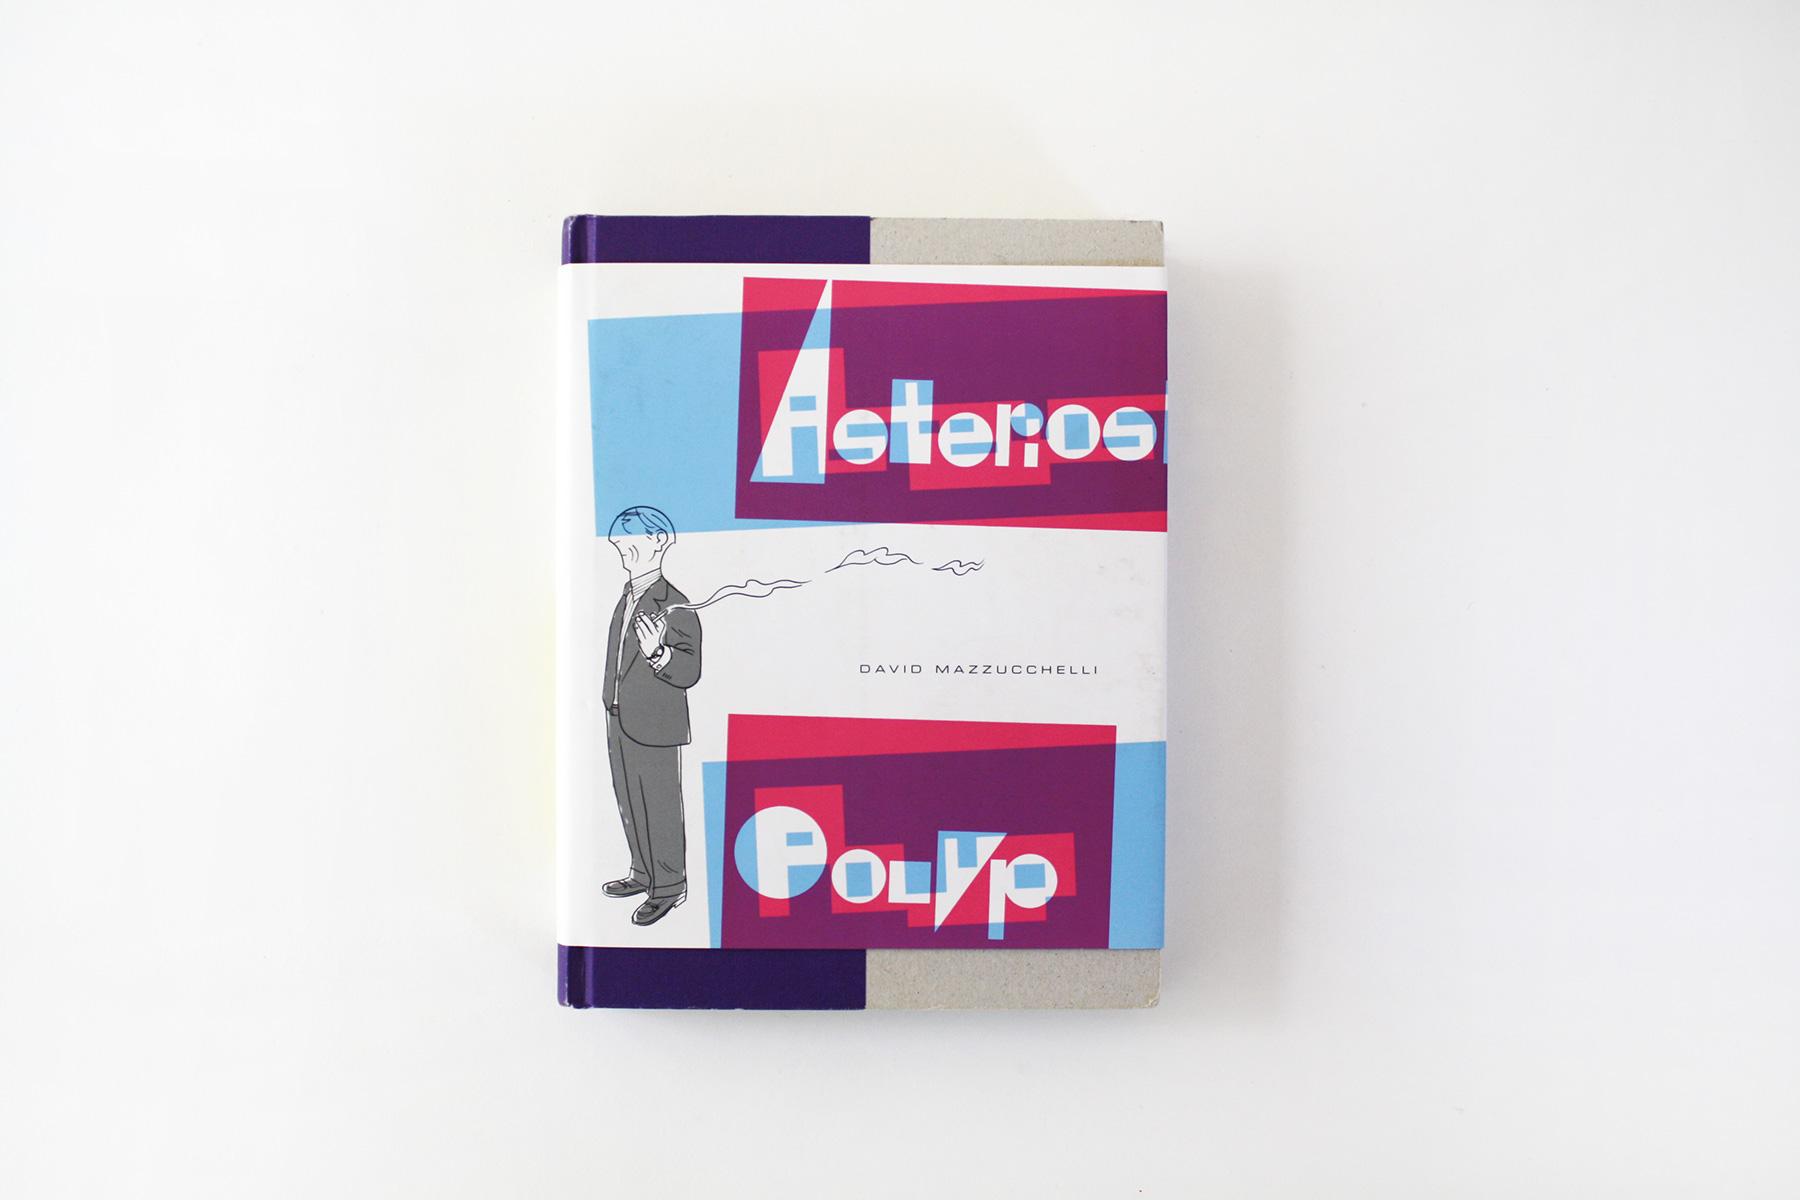 asterios-polyp-1.jpg